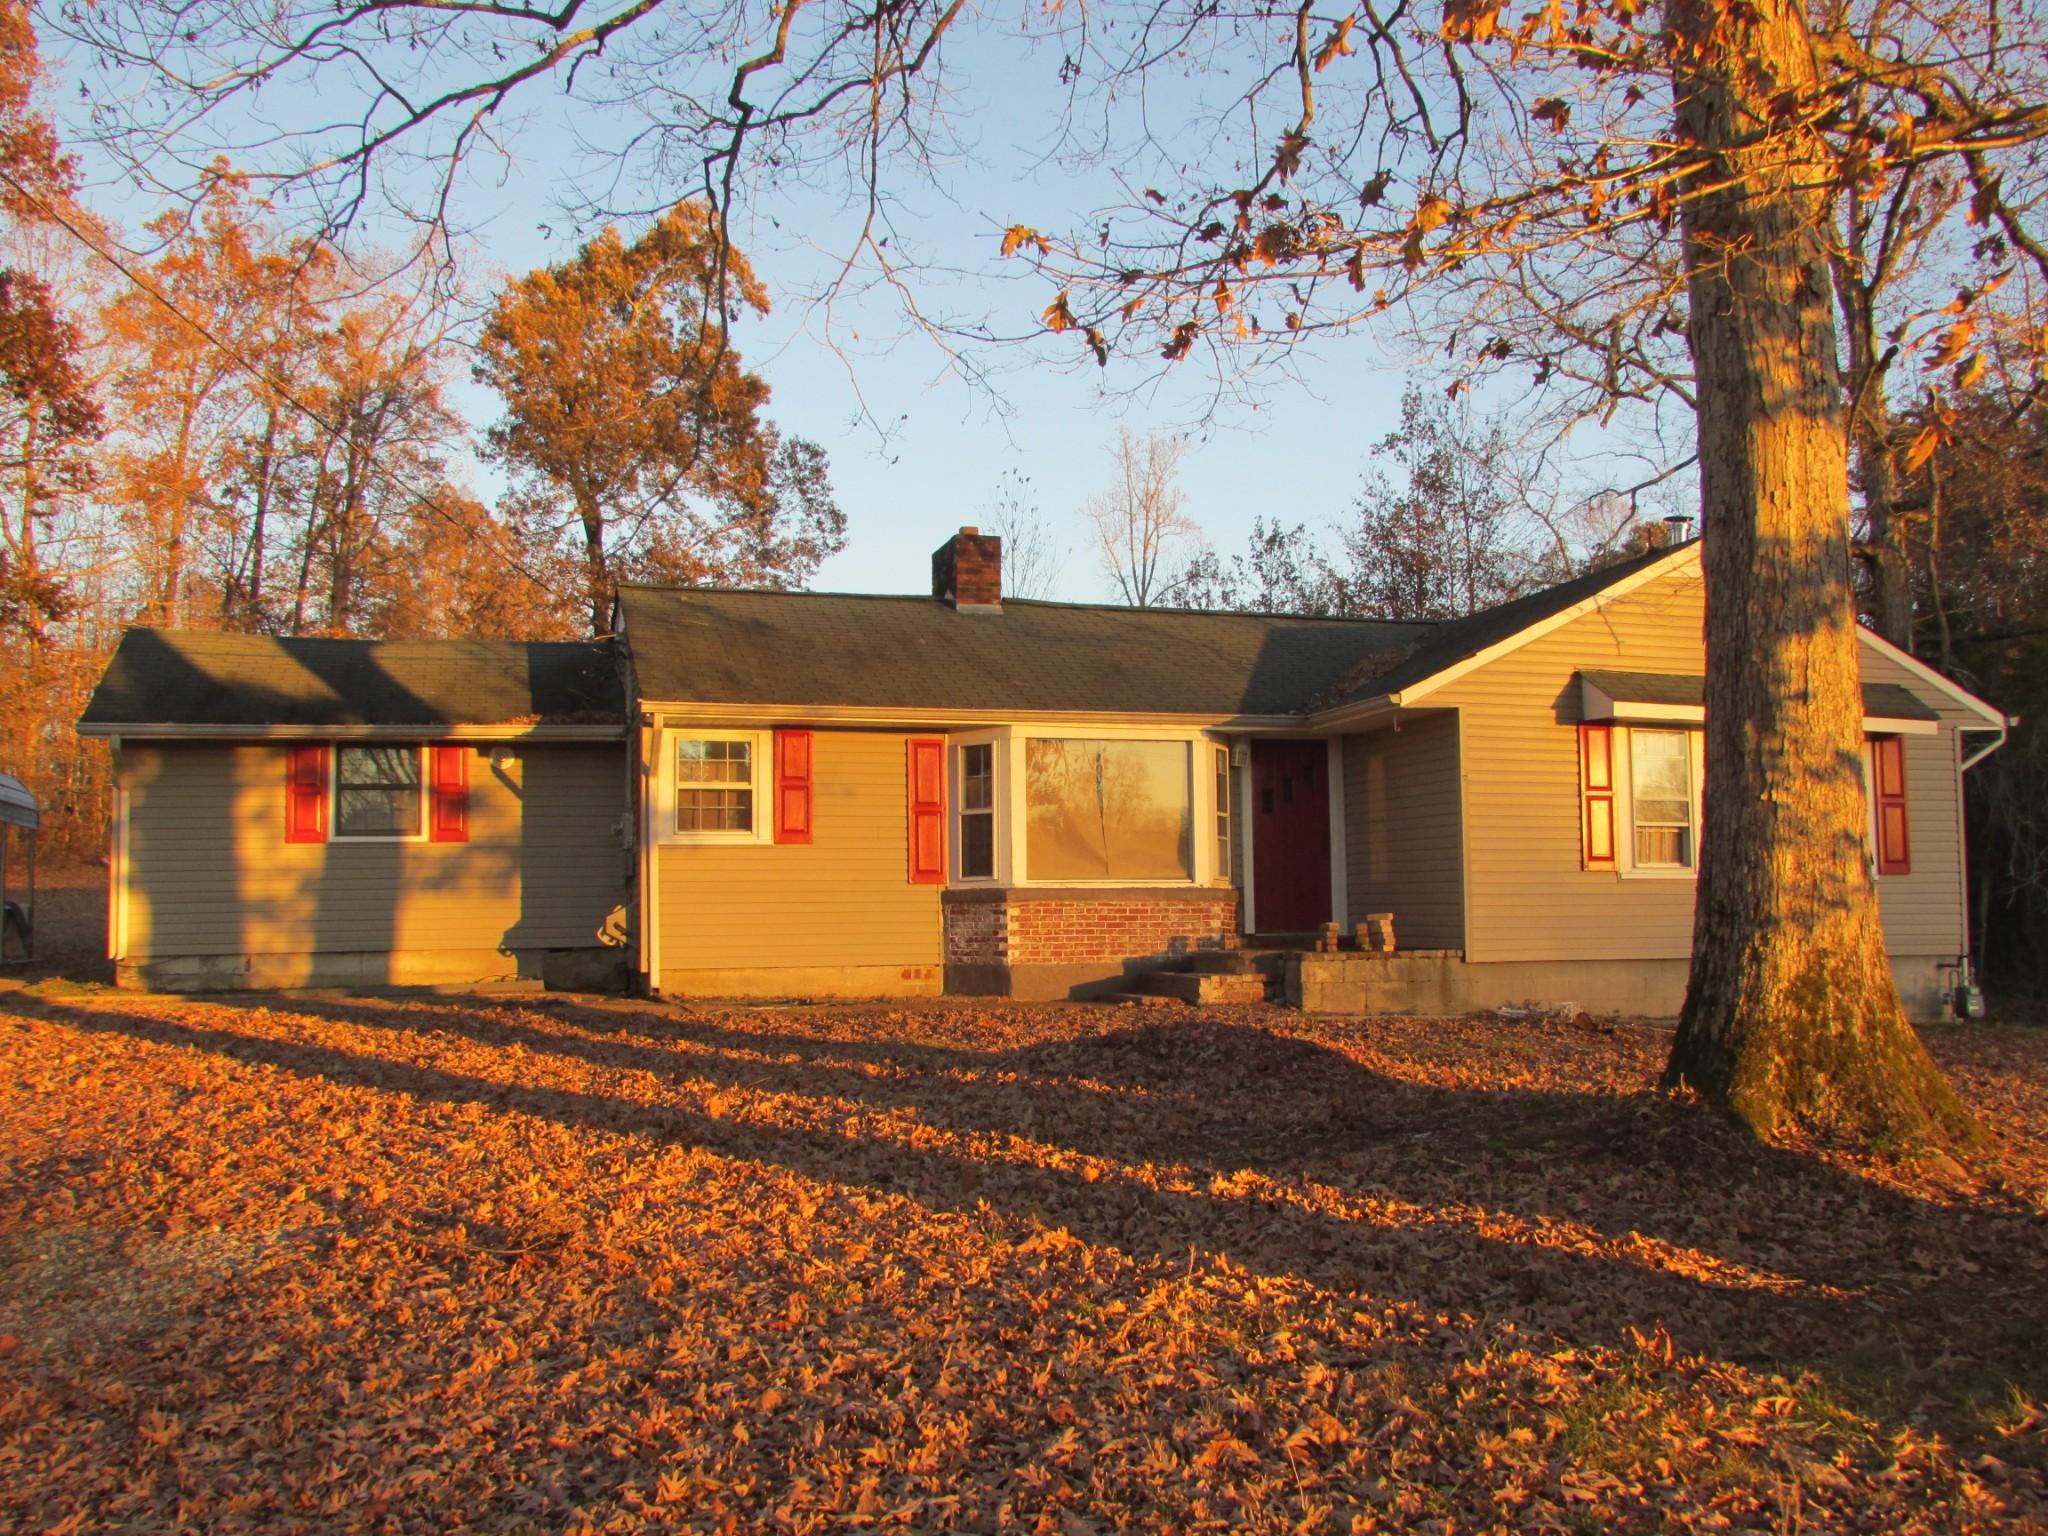 8 Rushing Ln, E, Leoma, TN 38468 - Leoma, TN real estate listing